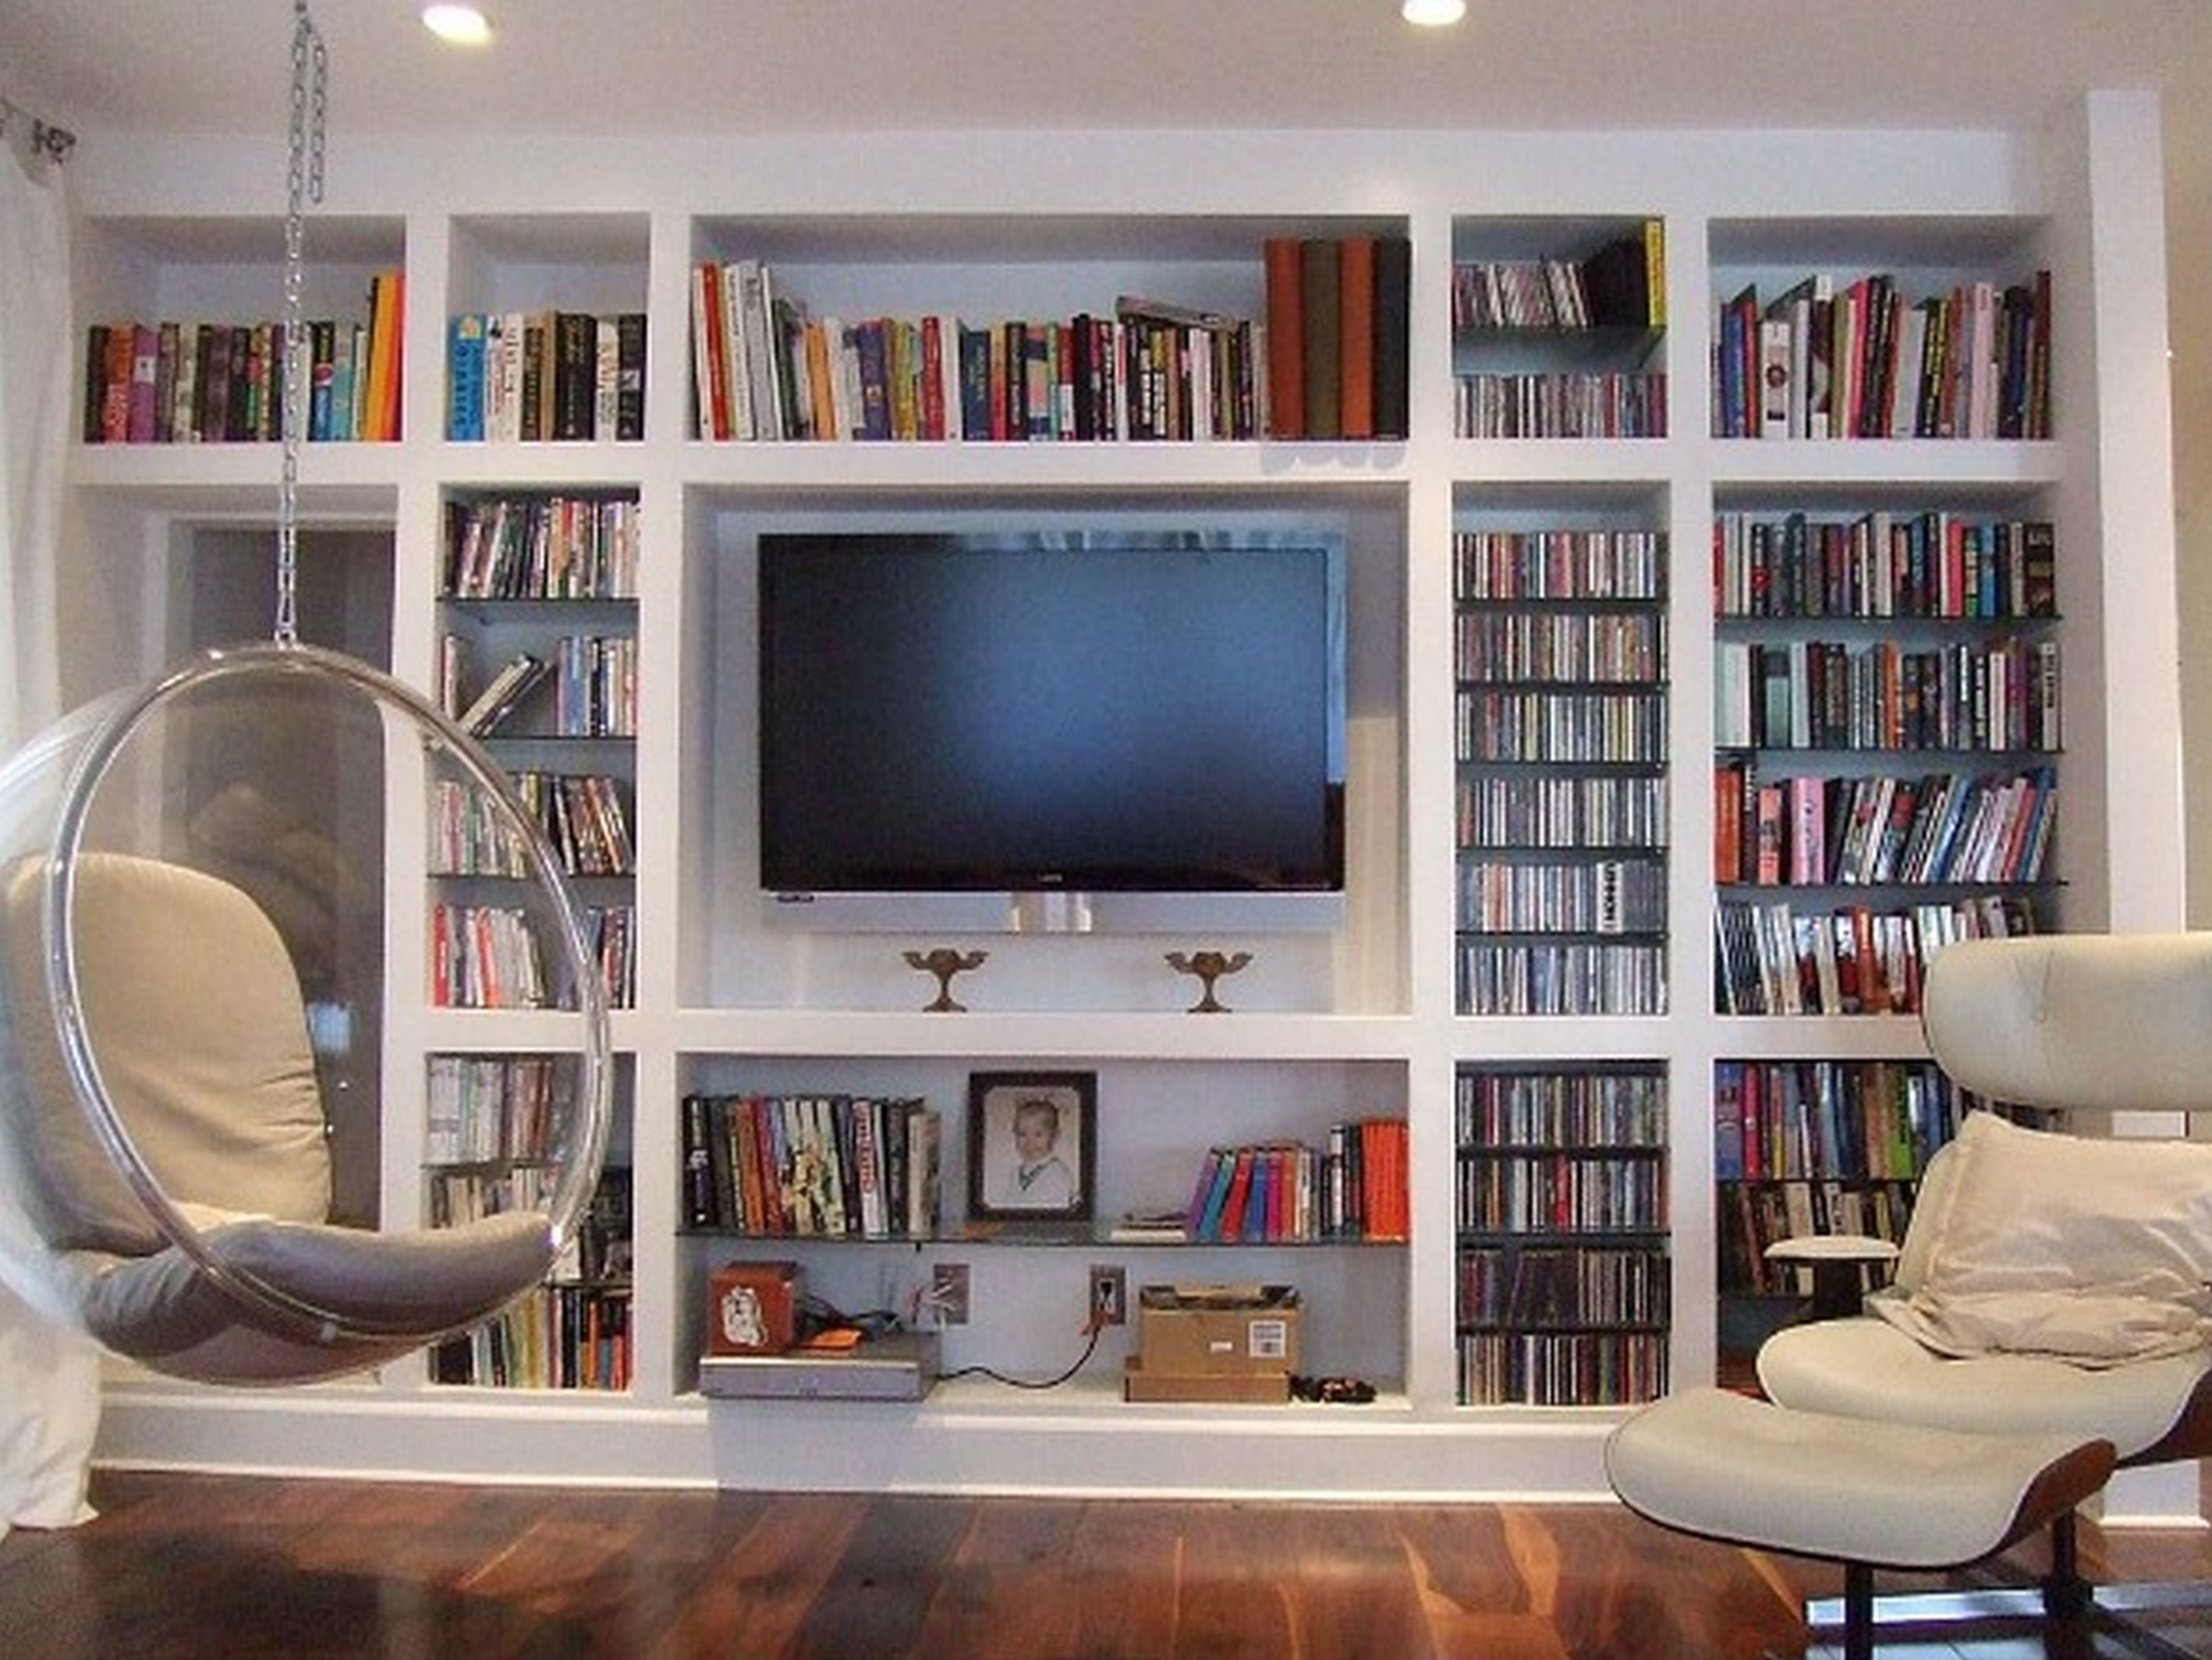 Tv Bookshelves Antevortaco Throughout Tv In Bookcase (#13 of 14)